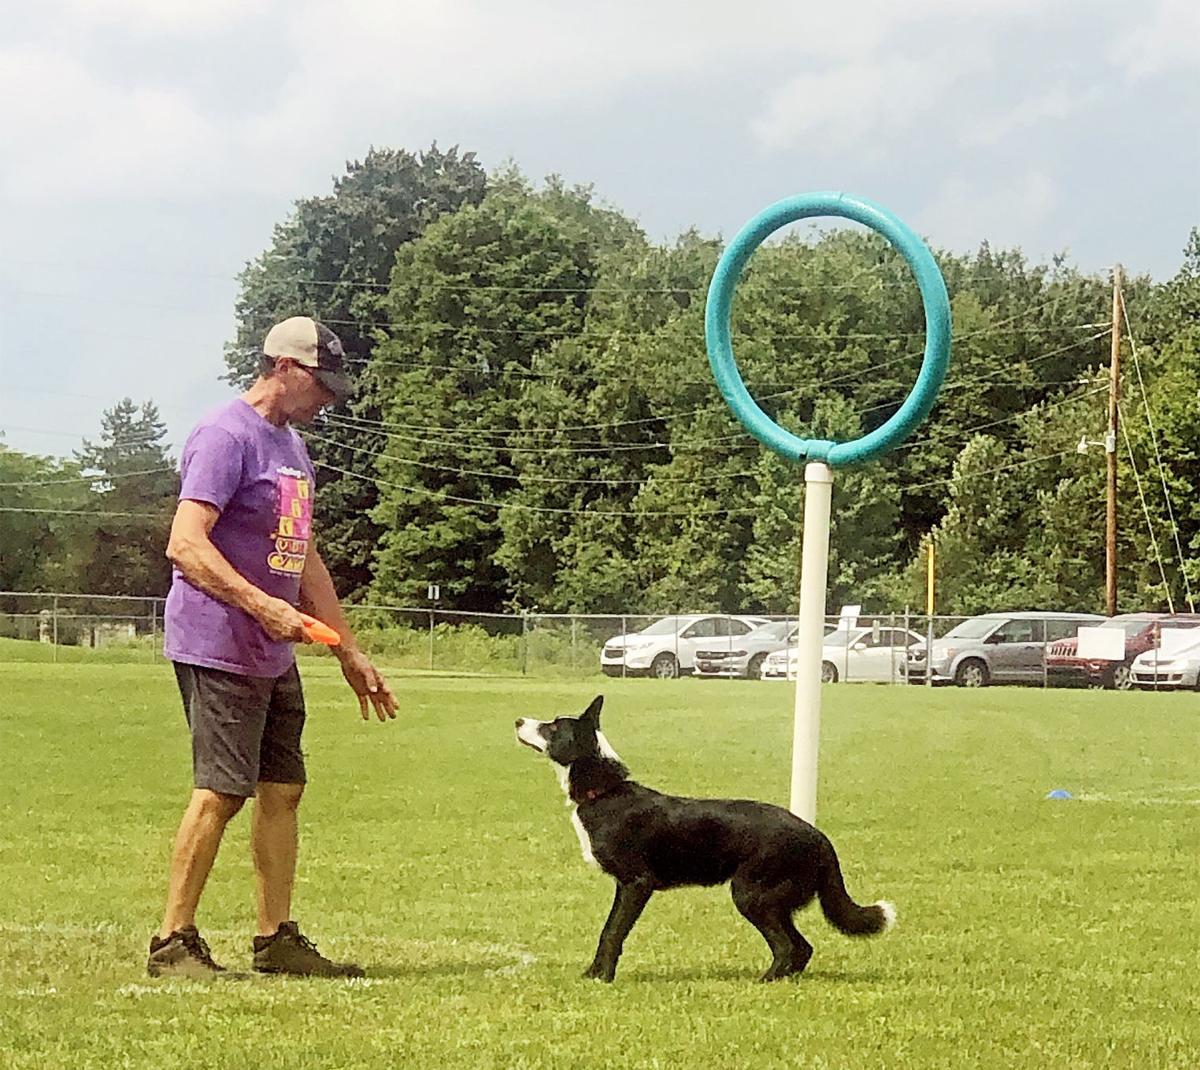 Frisbee throwing